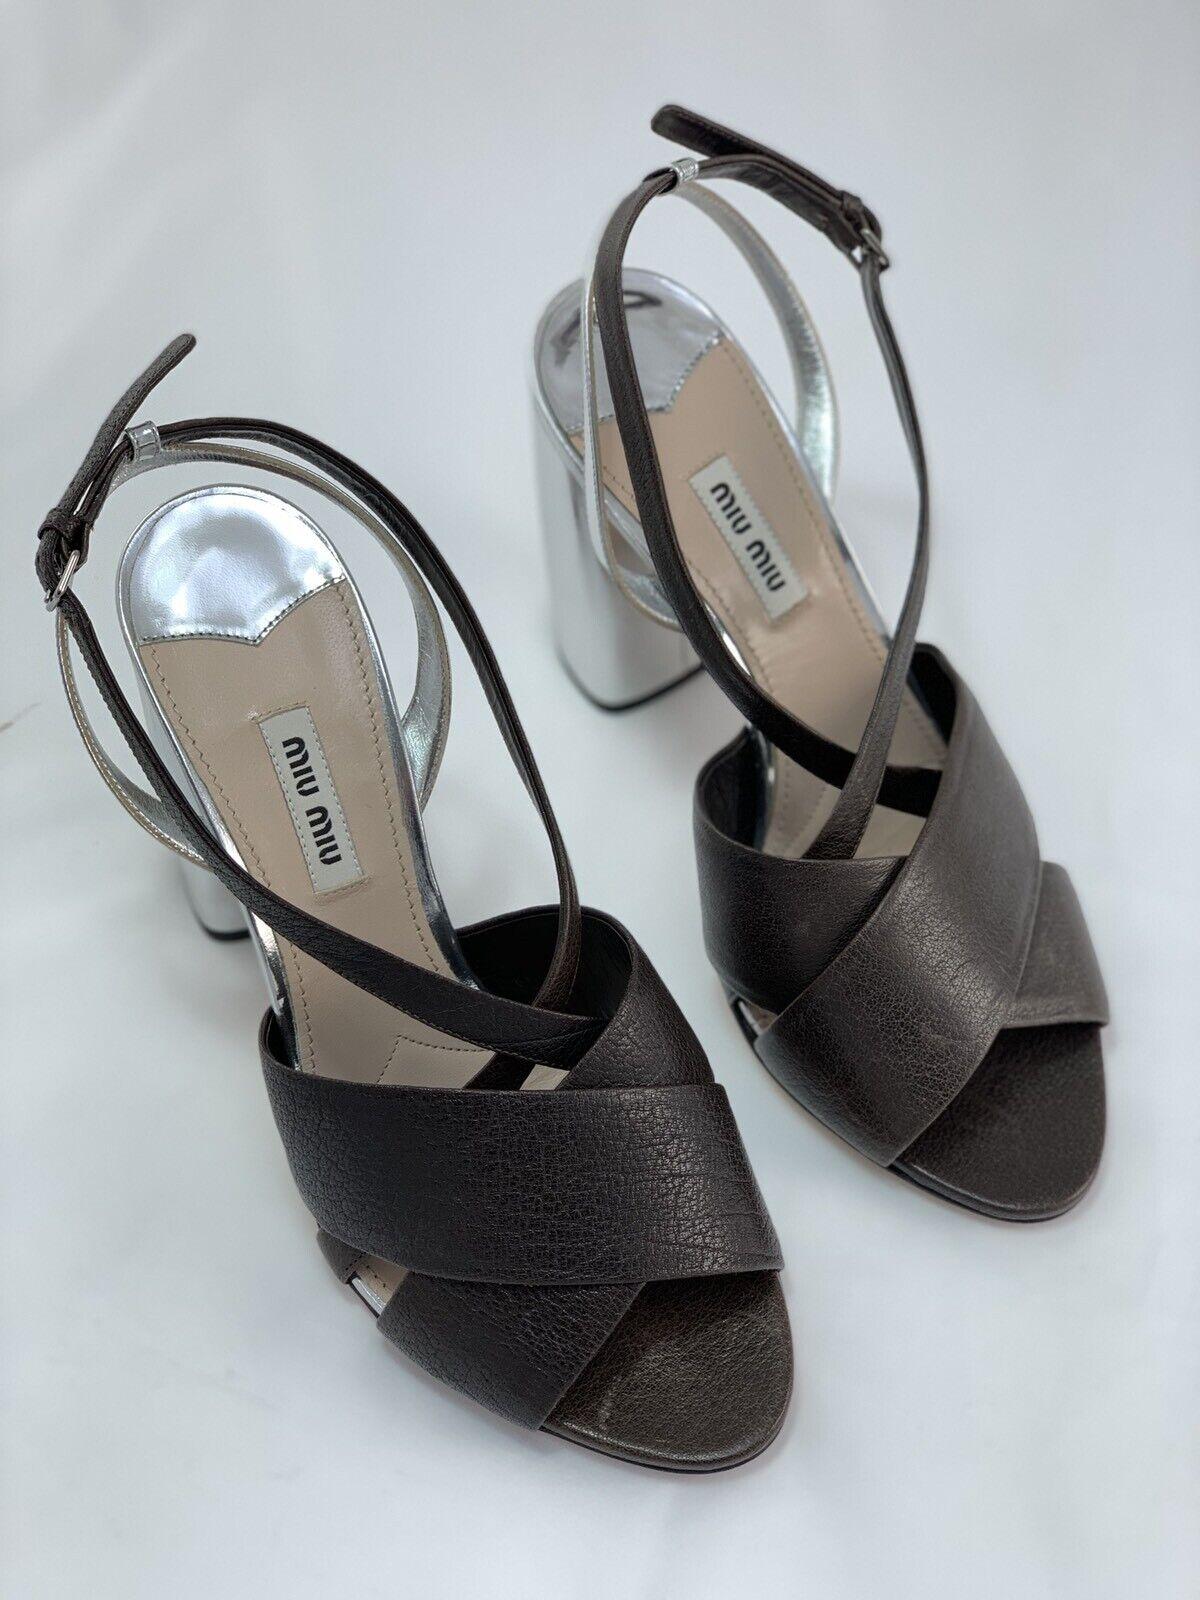 Miu Miu (Prada) High Heel Leather  Marronee argento scarpe - Dimensione UK 6   EU 40  basso prezzo del 40%